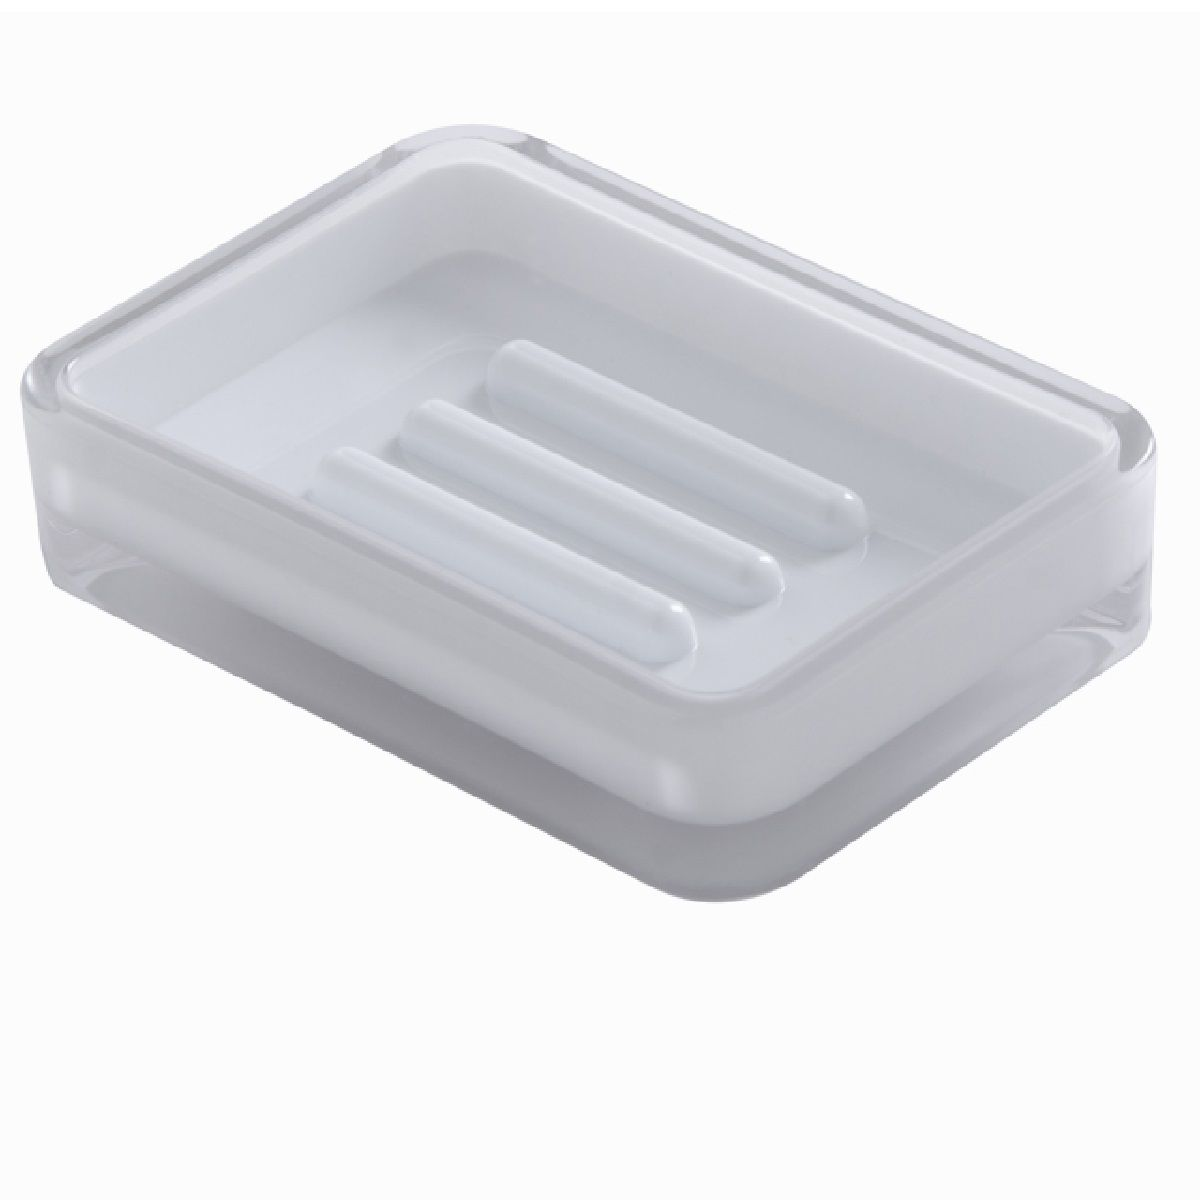 Saboneteira Dupla Camada KBB3/SB - Branco